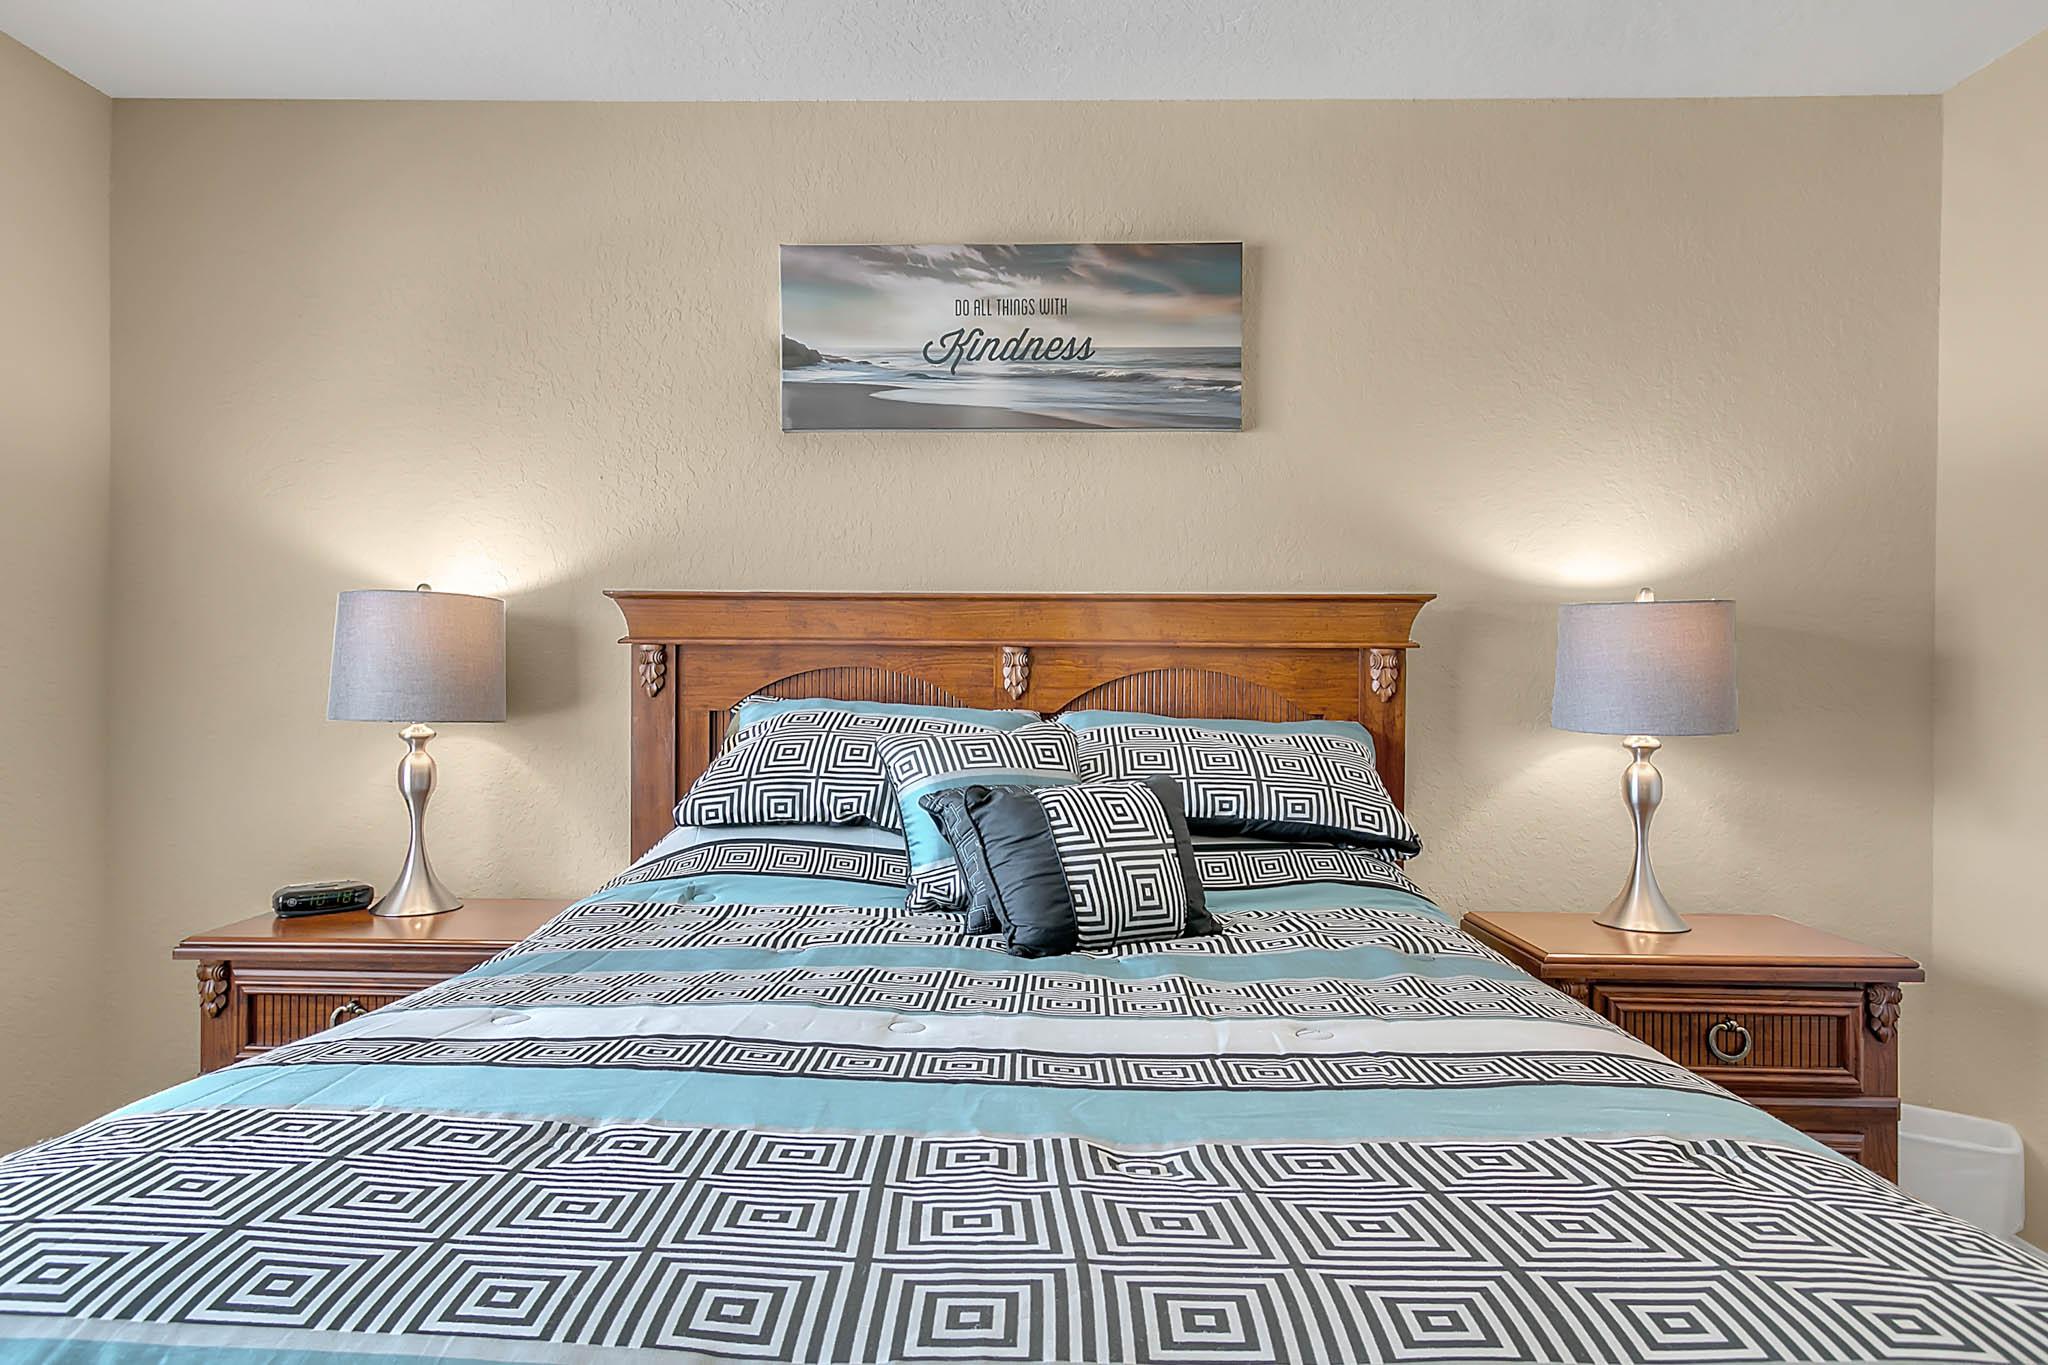 229-N-Hampton-Dr--Davenport--FL-33897----22---Bedroom.jpg